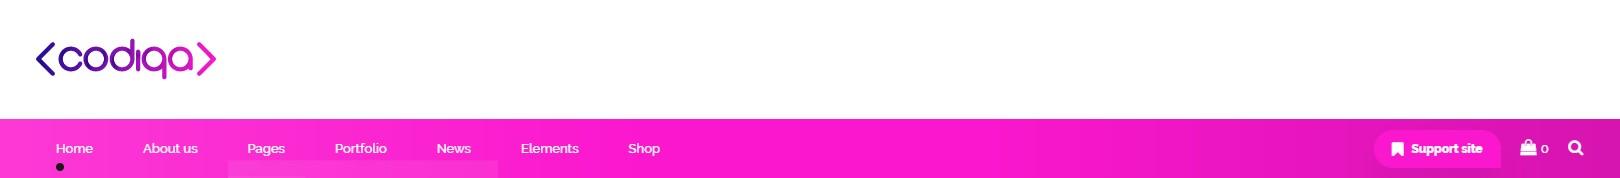 https://documentation.bold-themes.com/codiqa/wp-content/uploads/sites/49/2019/10/header-accent-gradient.jpg